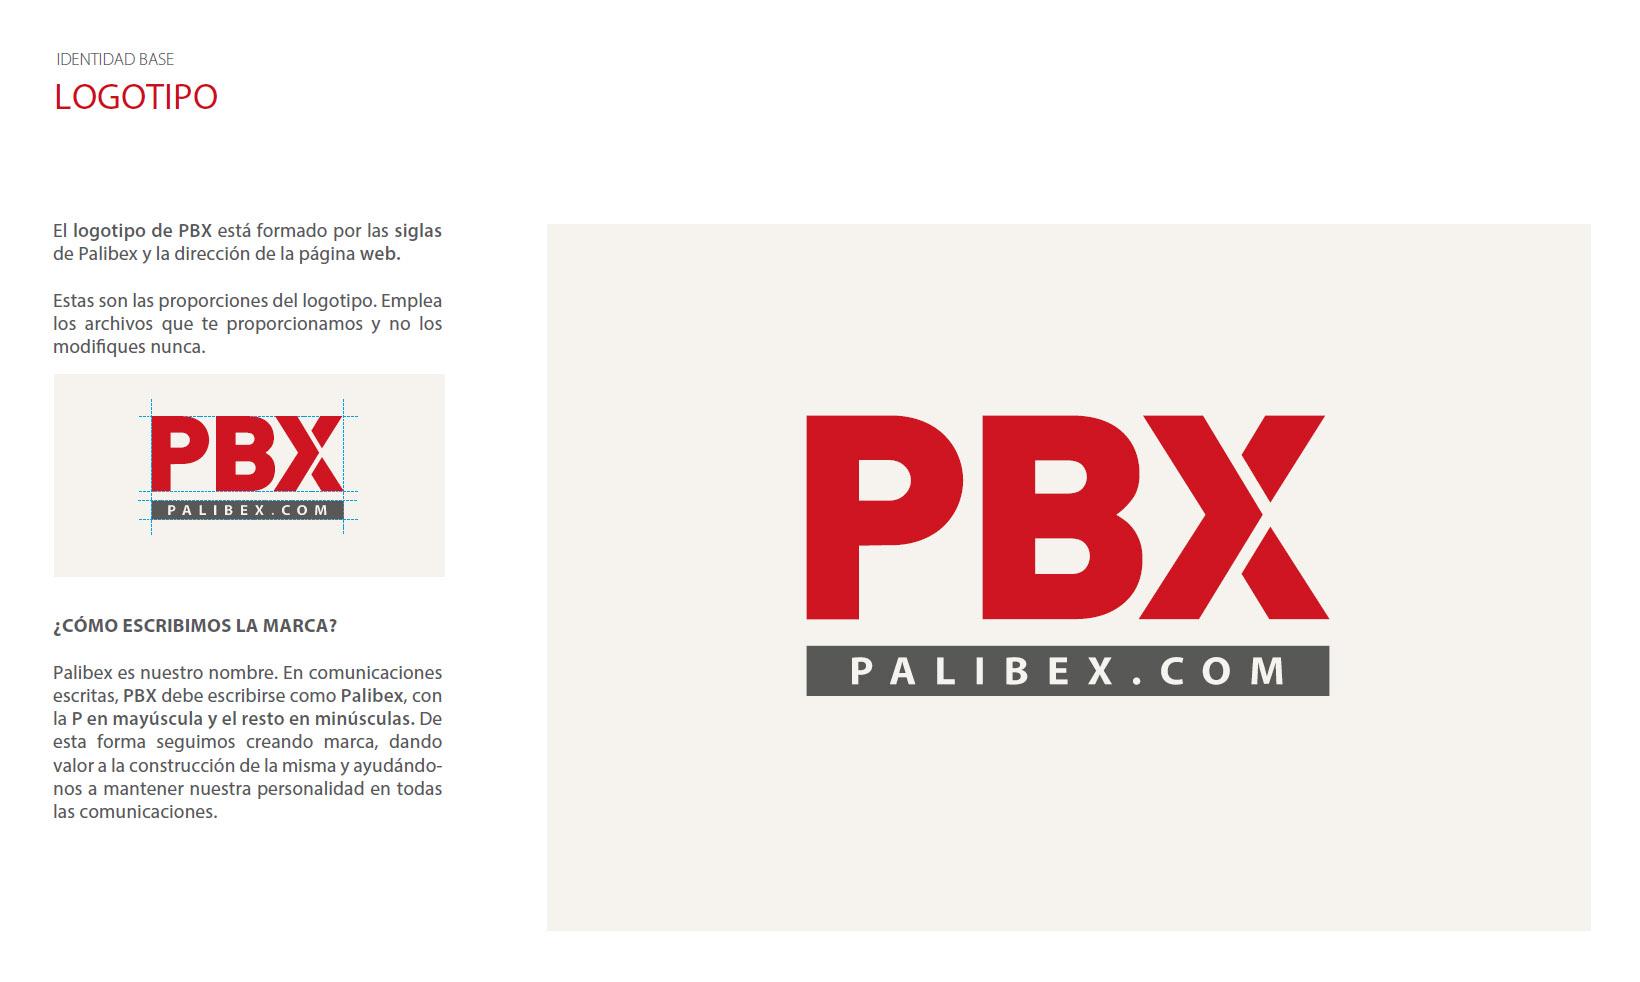 Palibex -PBX -Transporte urgente mercancia paletizada - Beusual